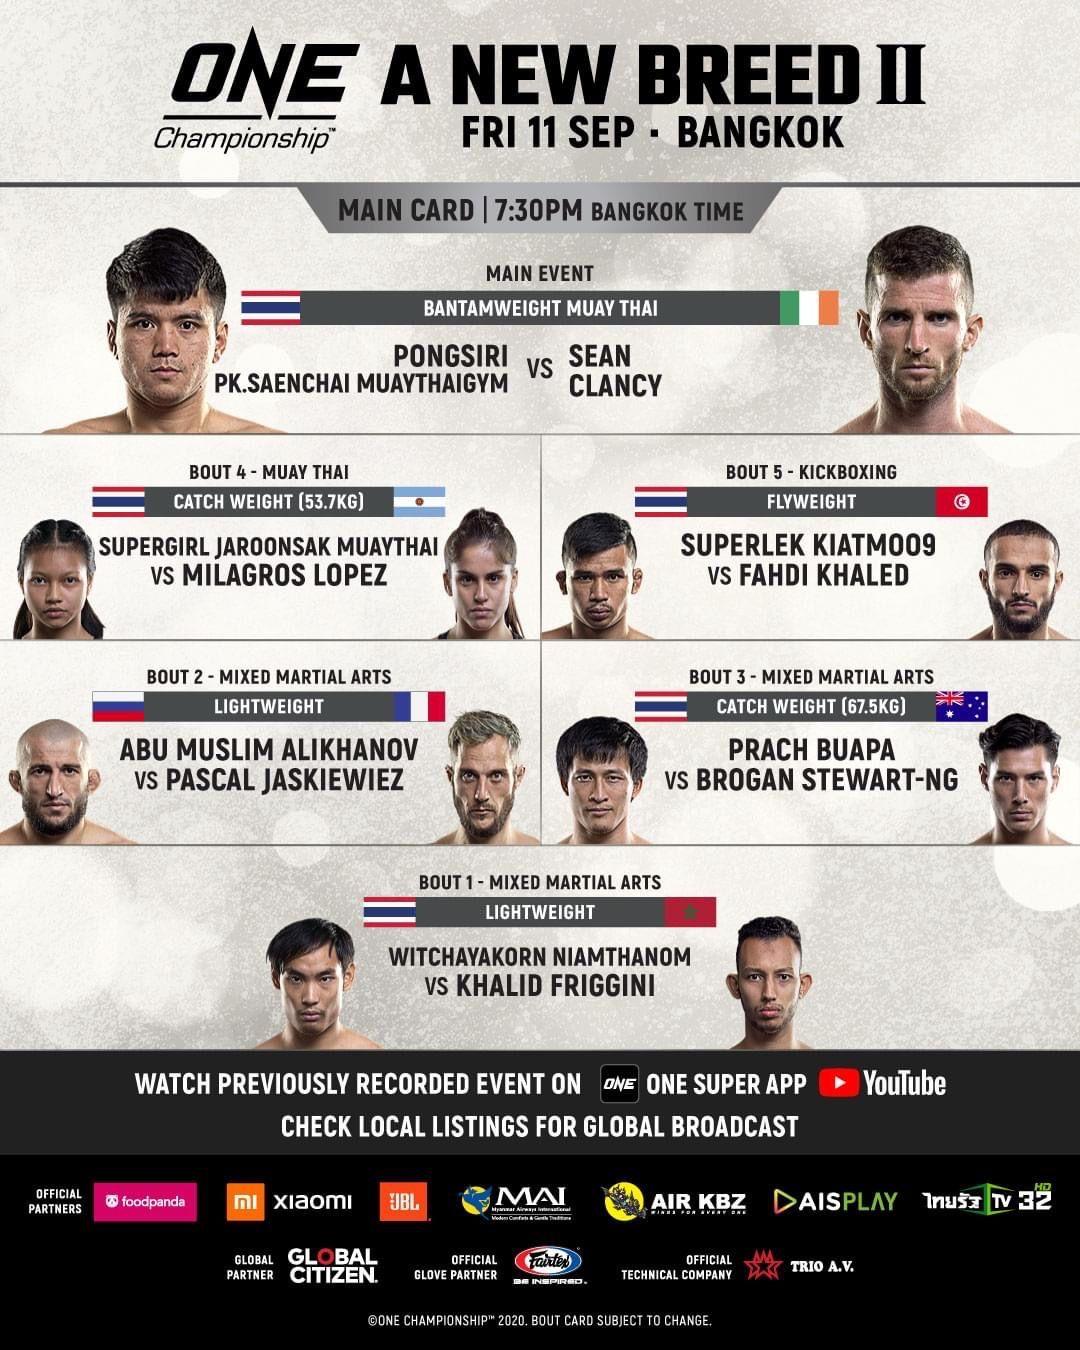 ONE Championship 2020 di Bangkok